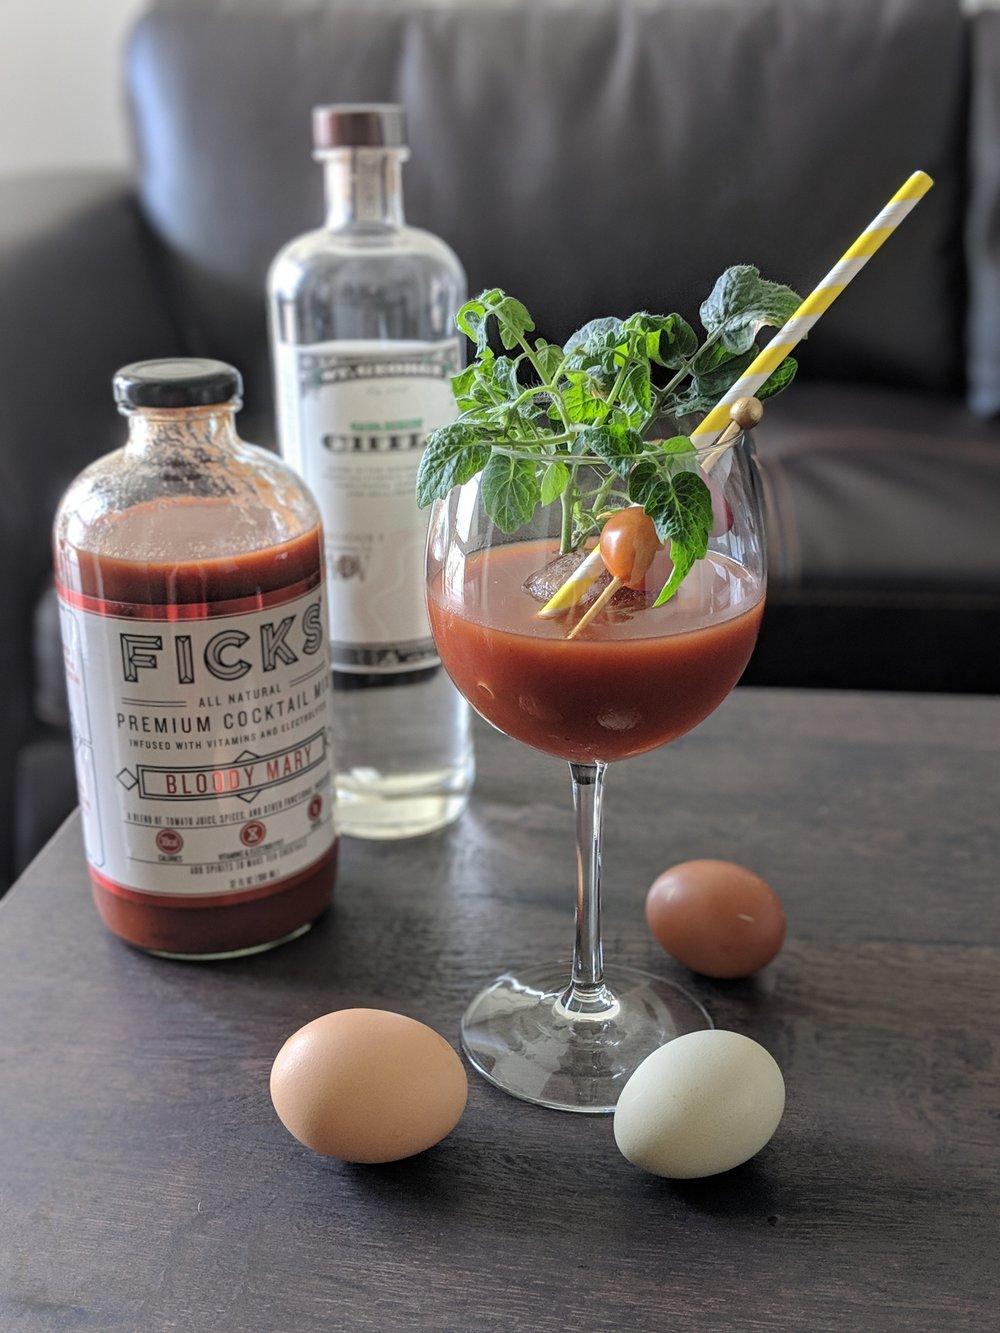 Bloody Mary: Ficks and St. George chili vodka. Liquid breakfast!